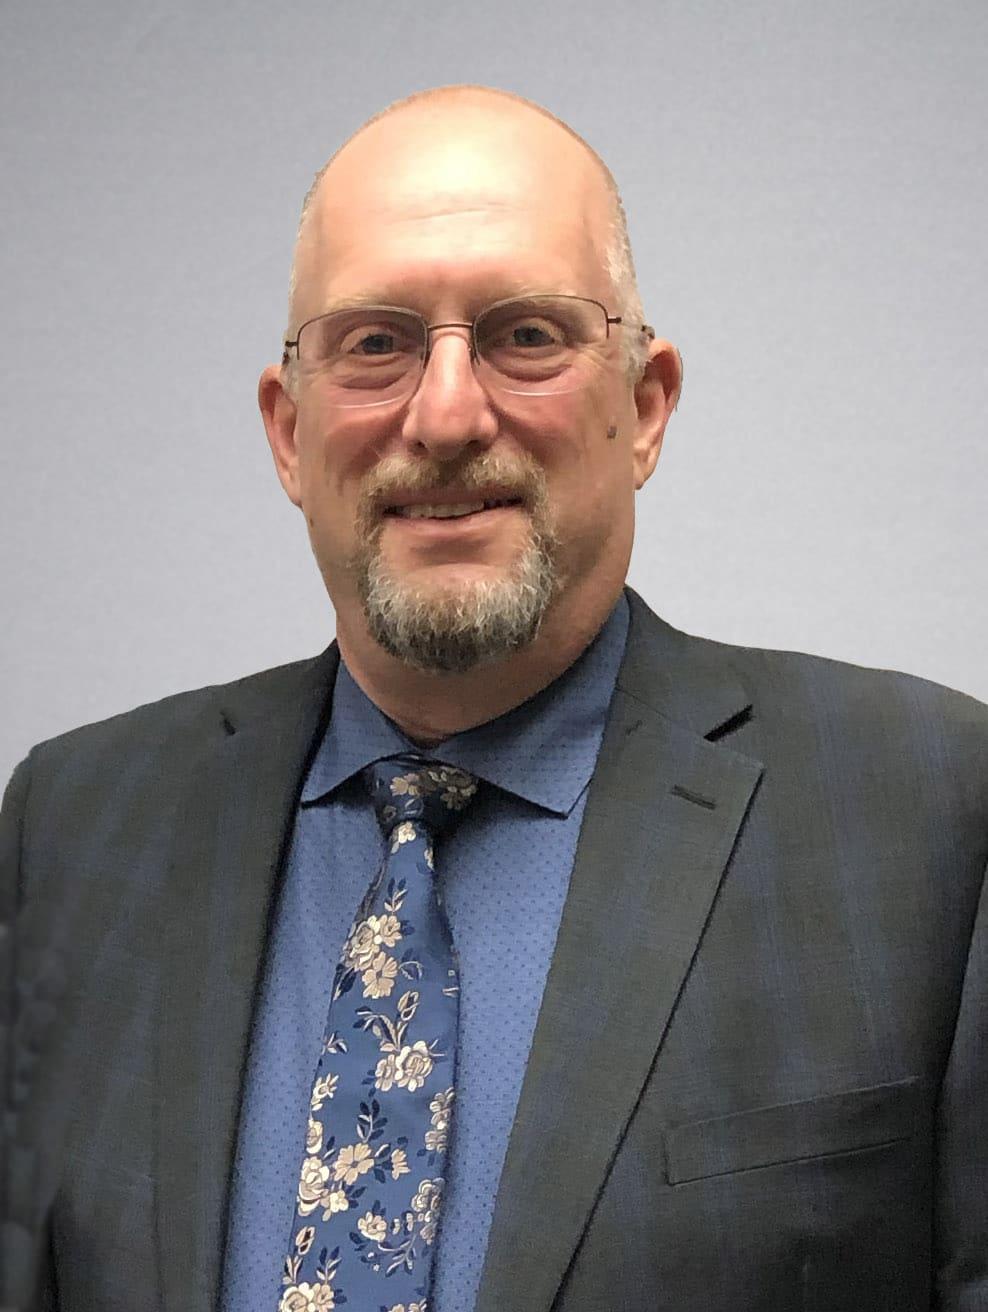 Jeffrey Hecht